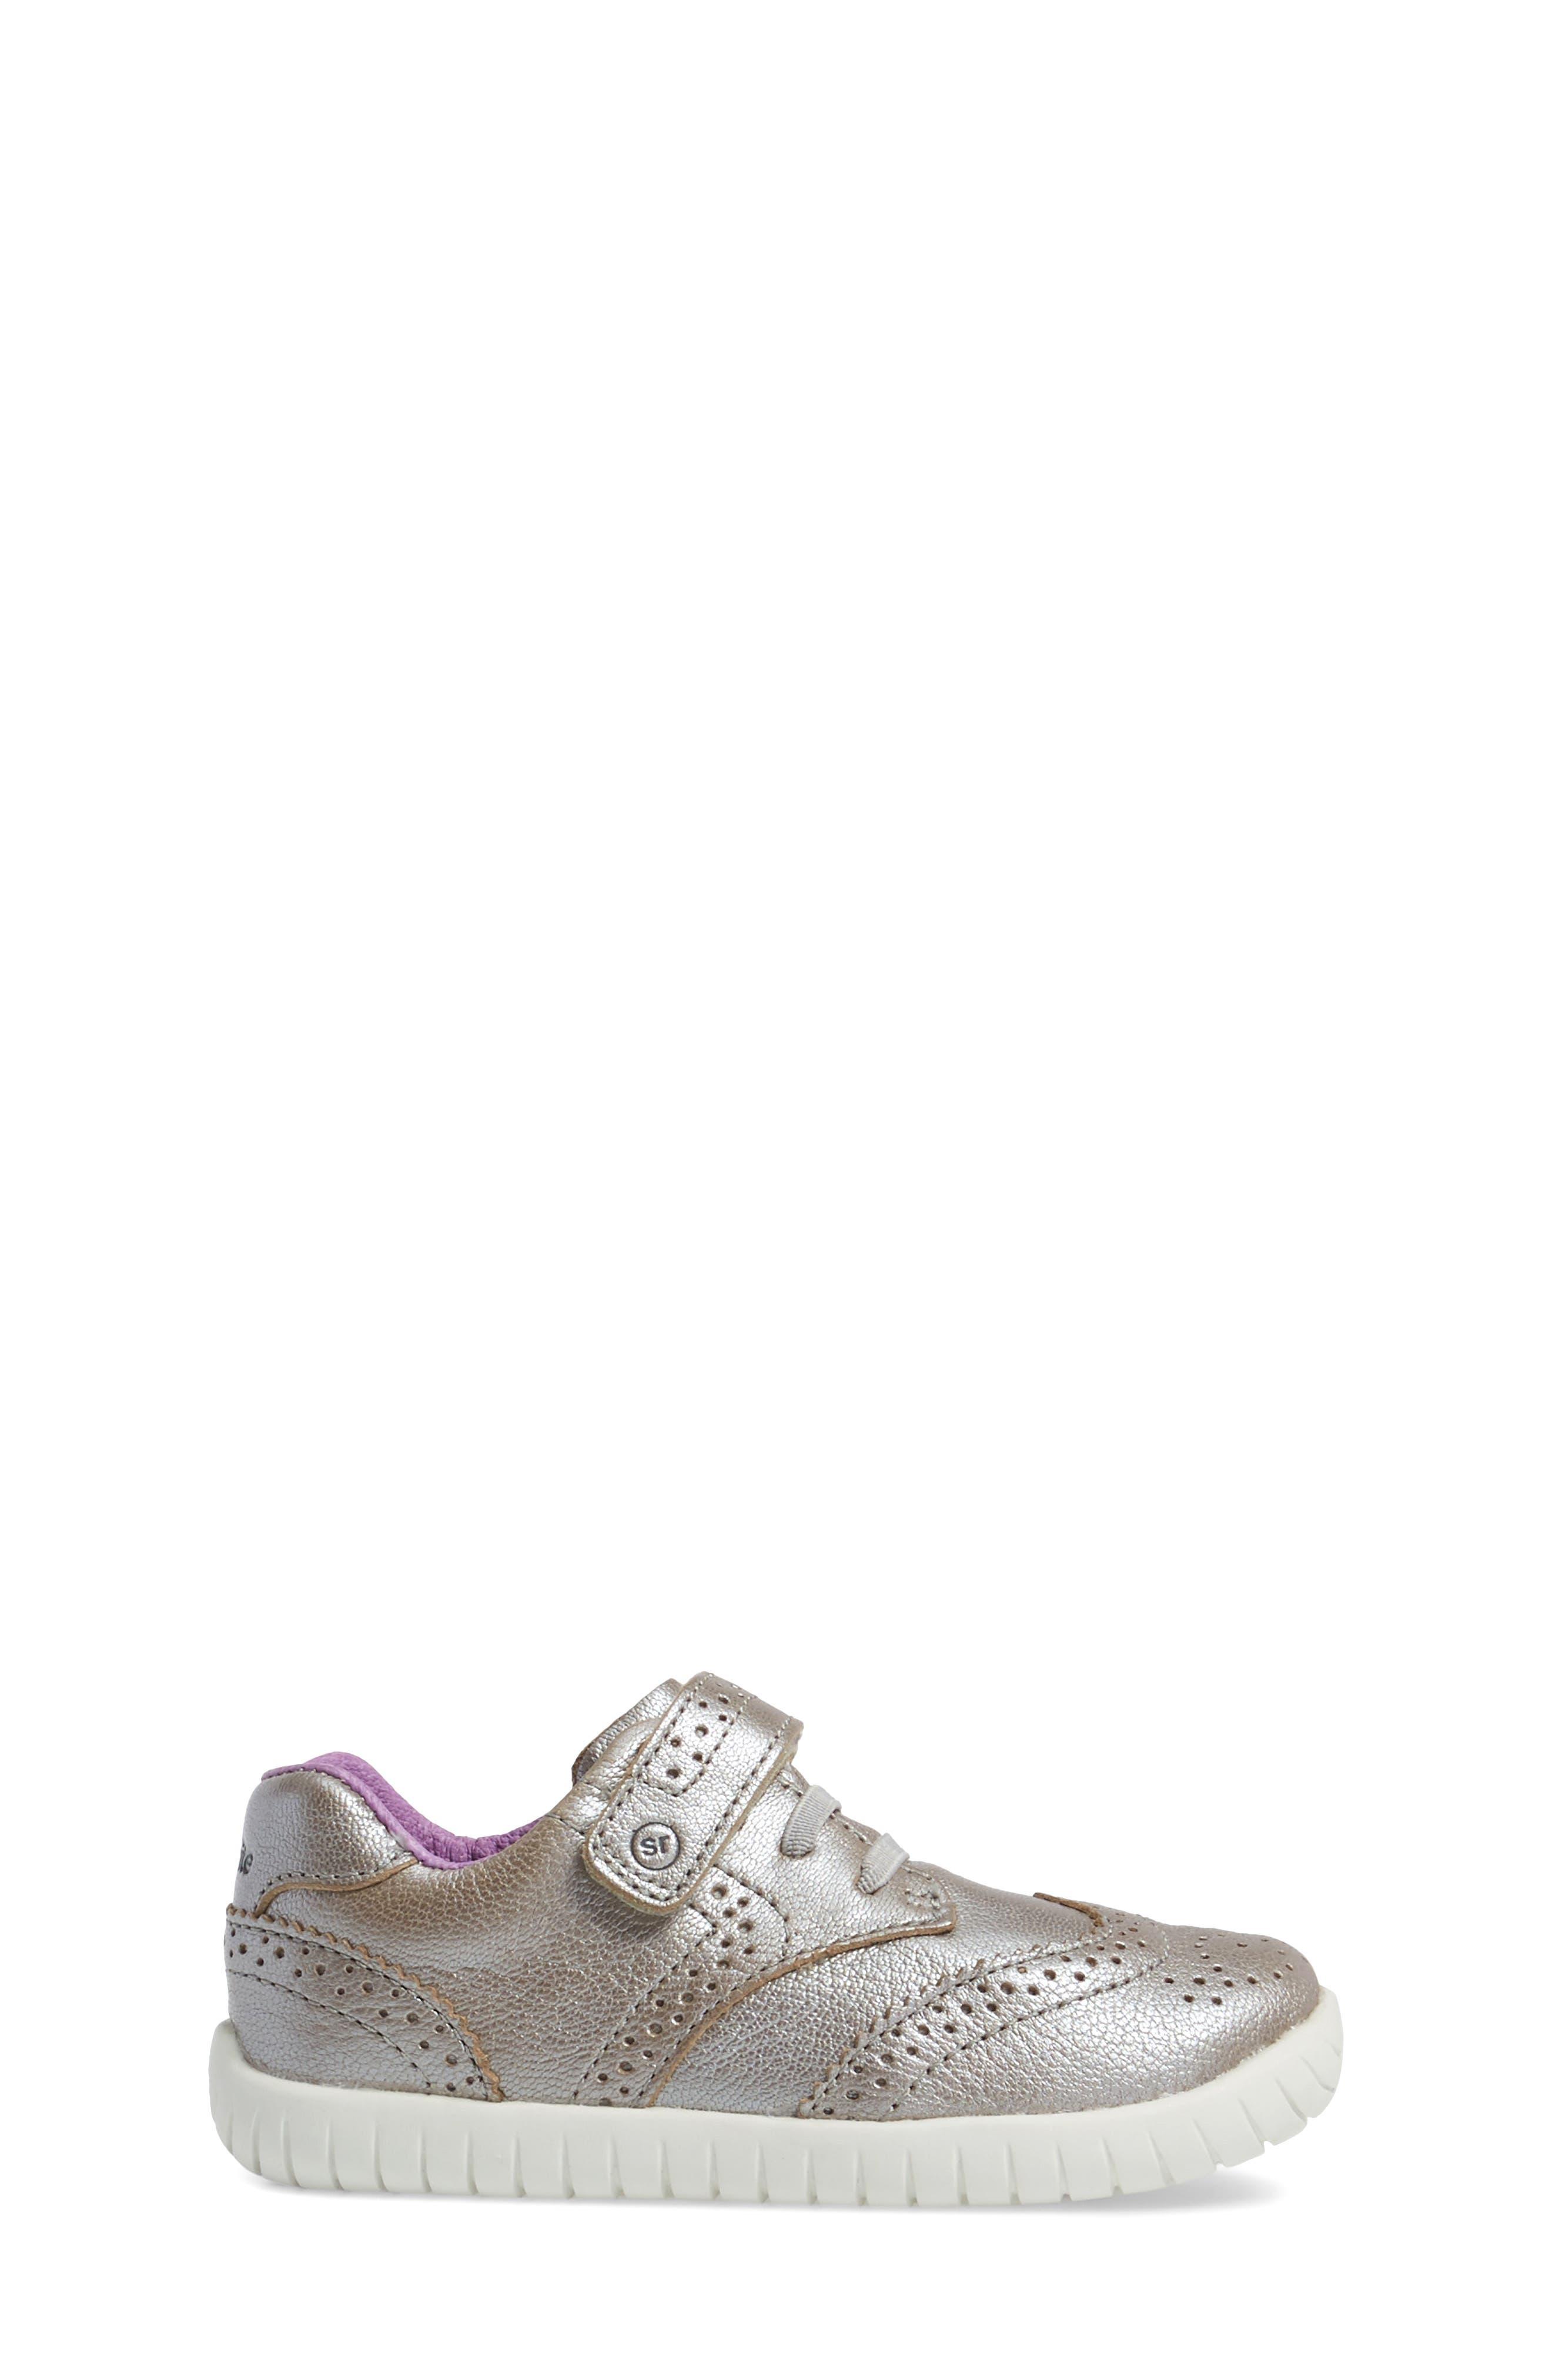 Addison Metallic Wingtip Sneaker,                             Alternate thumbnail 3, color,                             040